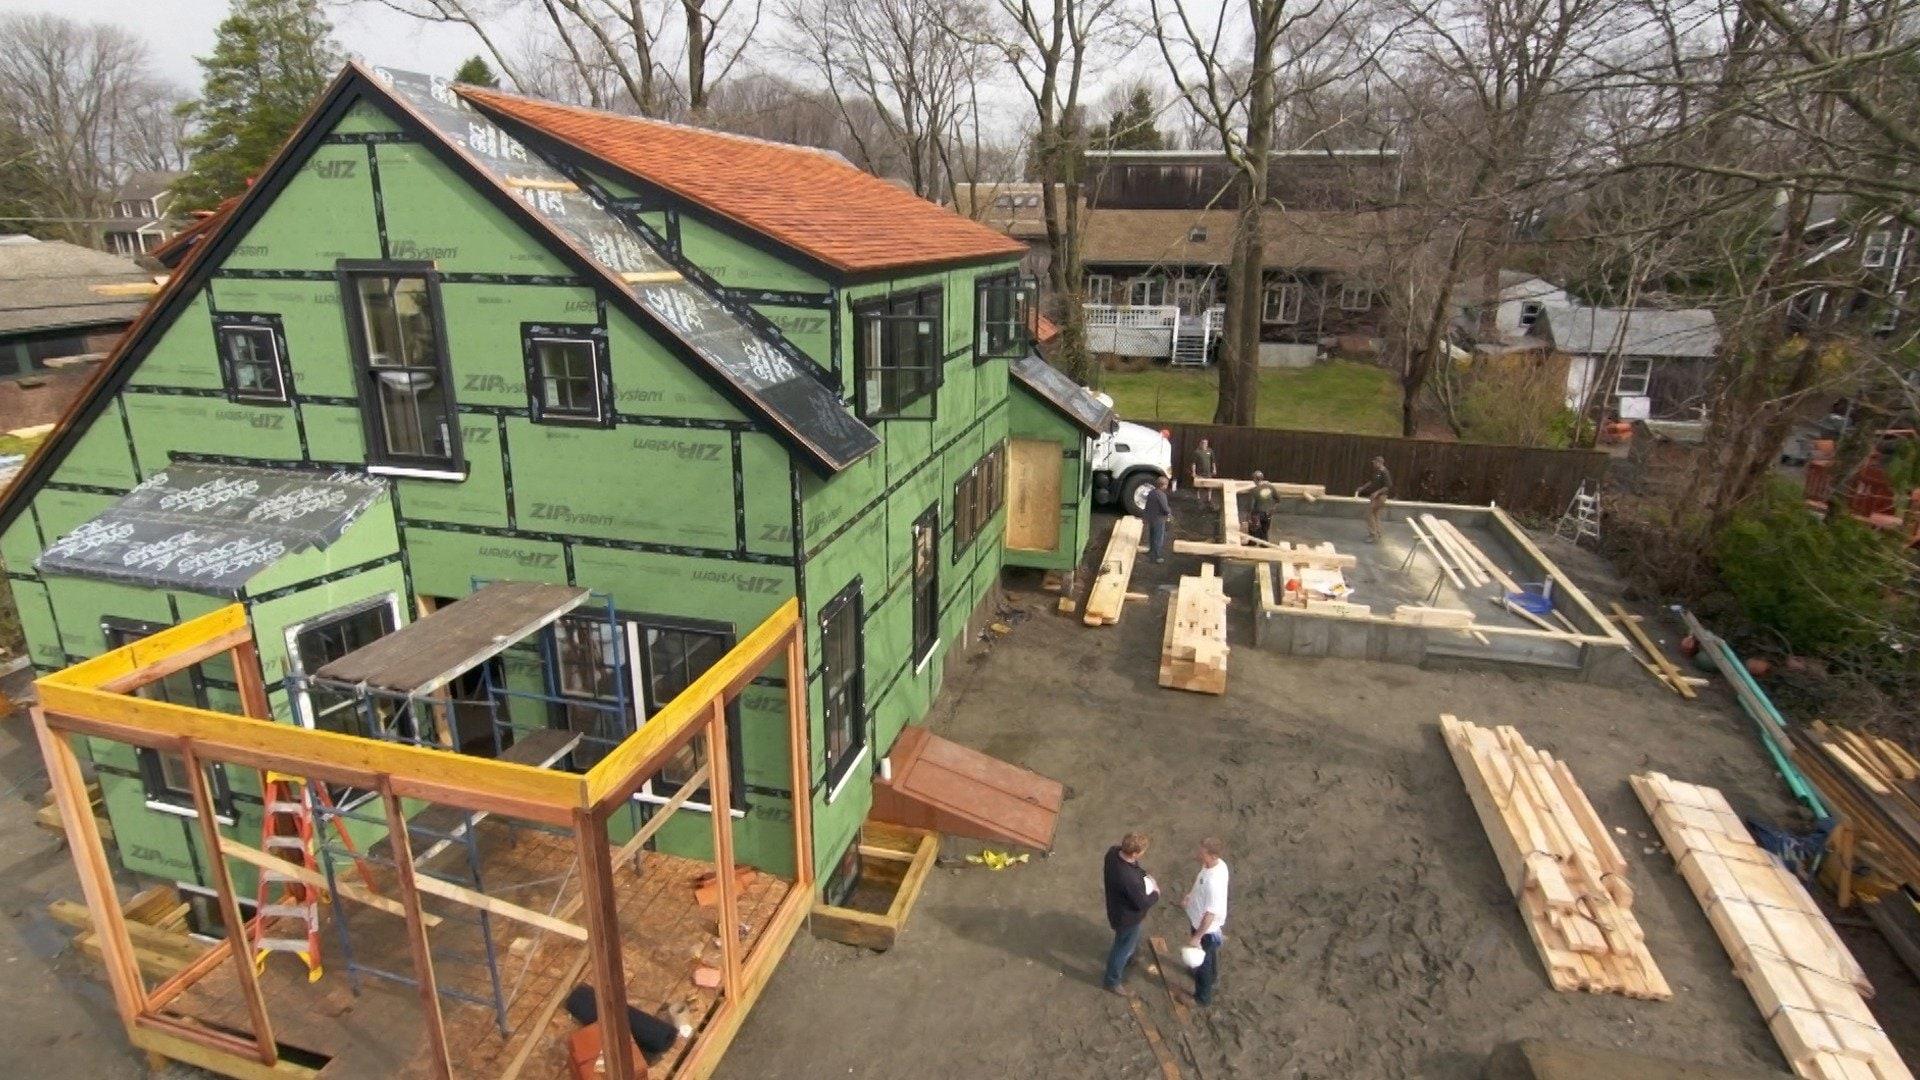 The Jamestown Net-Zero House: Modern Barn Raising